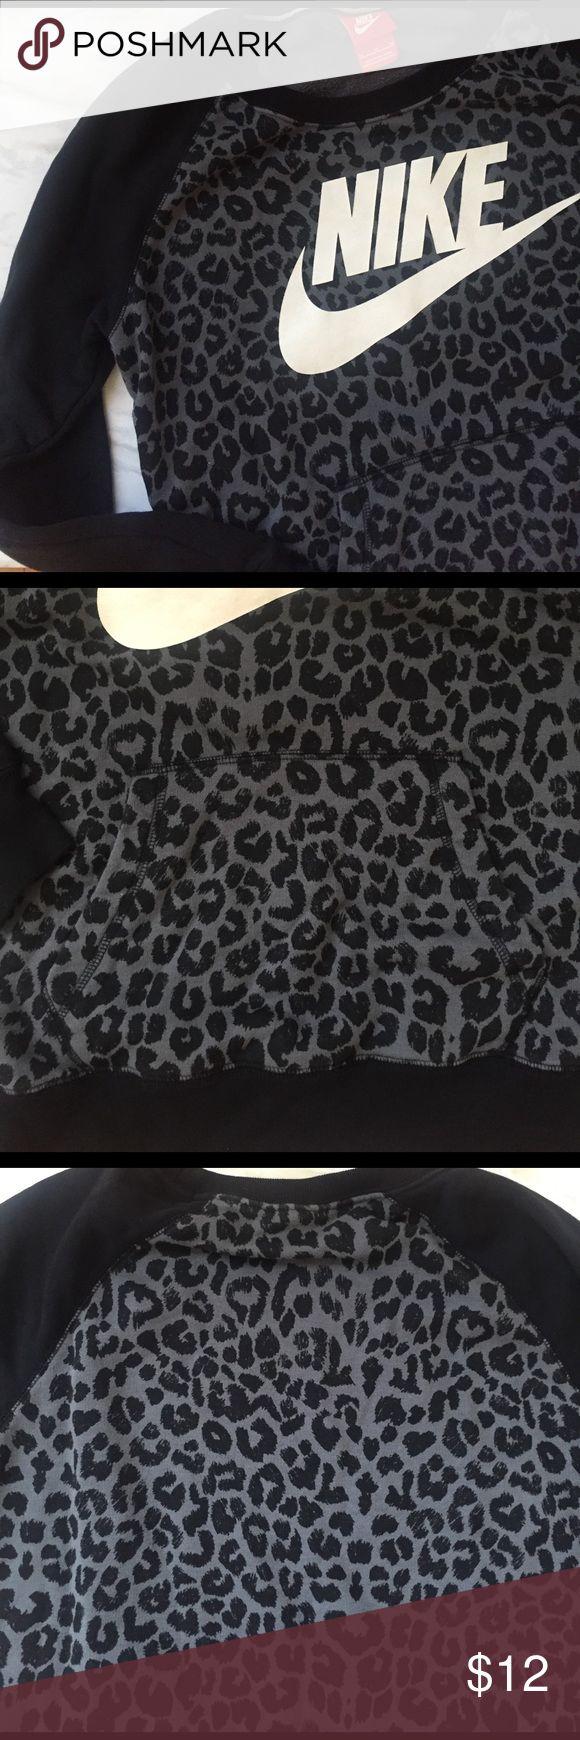 Nike Leopard print sweatshirt Crewneck Black + grey leopard print and black solid arms with Nike in white font on front.  Large front pocket. Size medium and TTS Nike Sweaters Crew & Scoop Necks